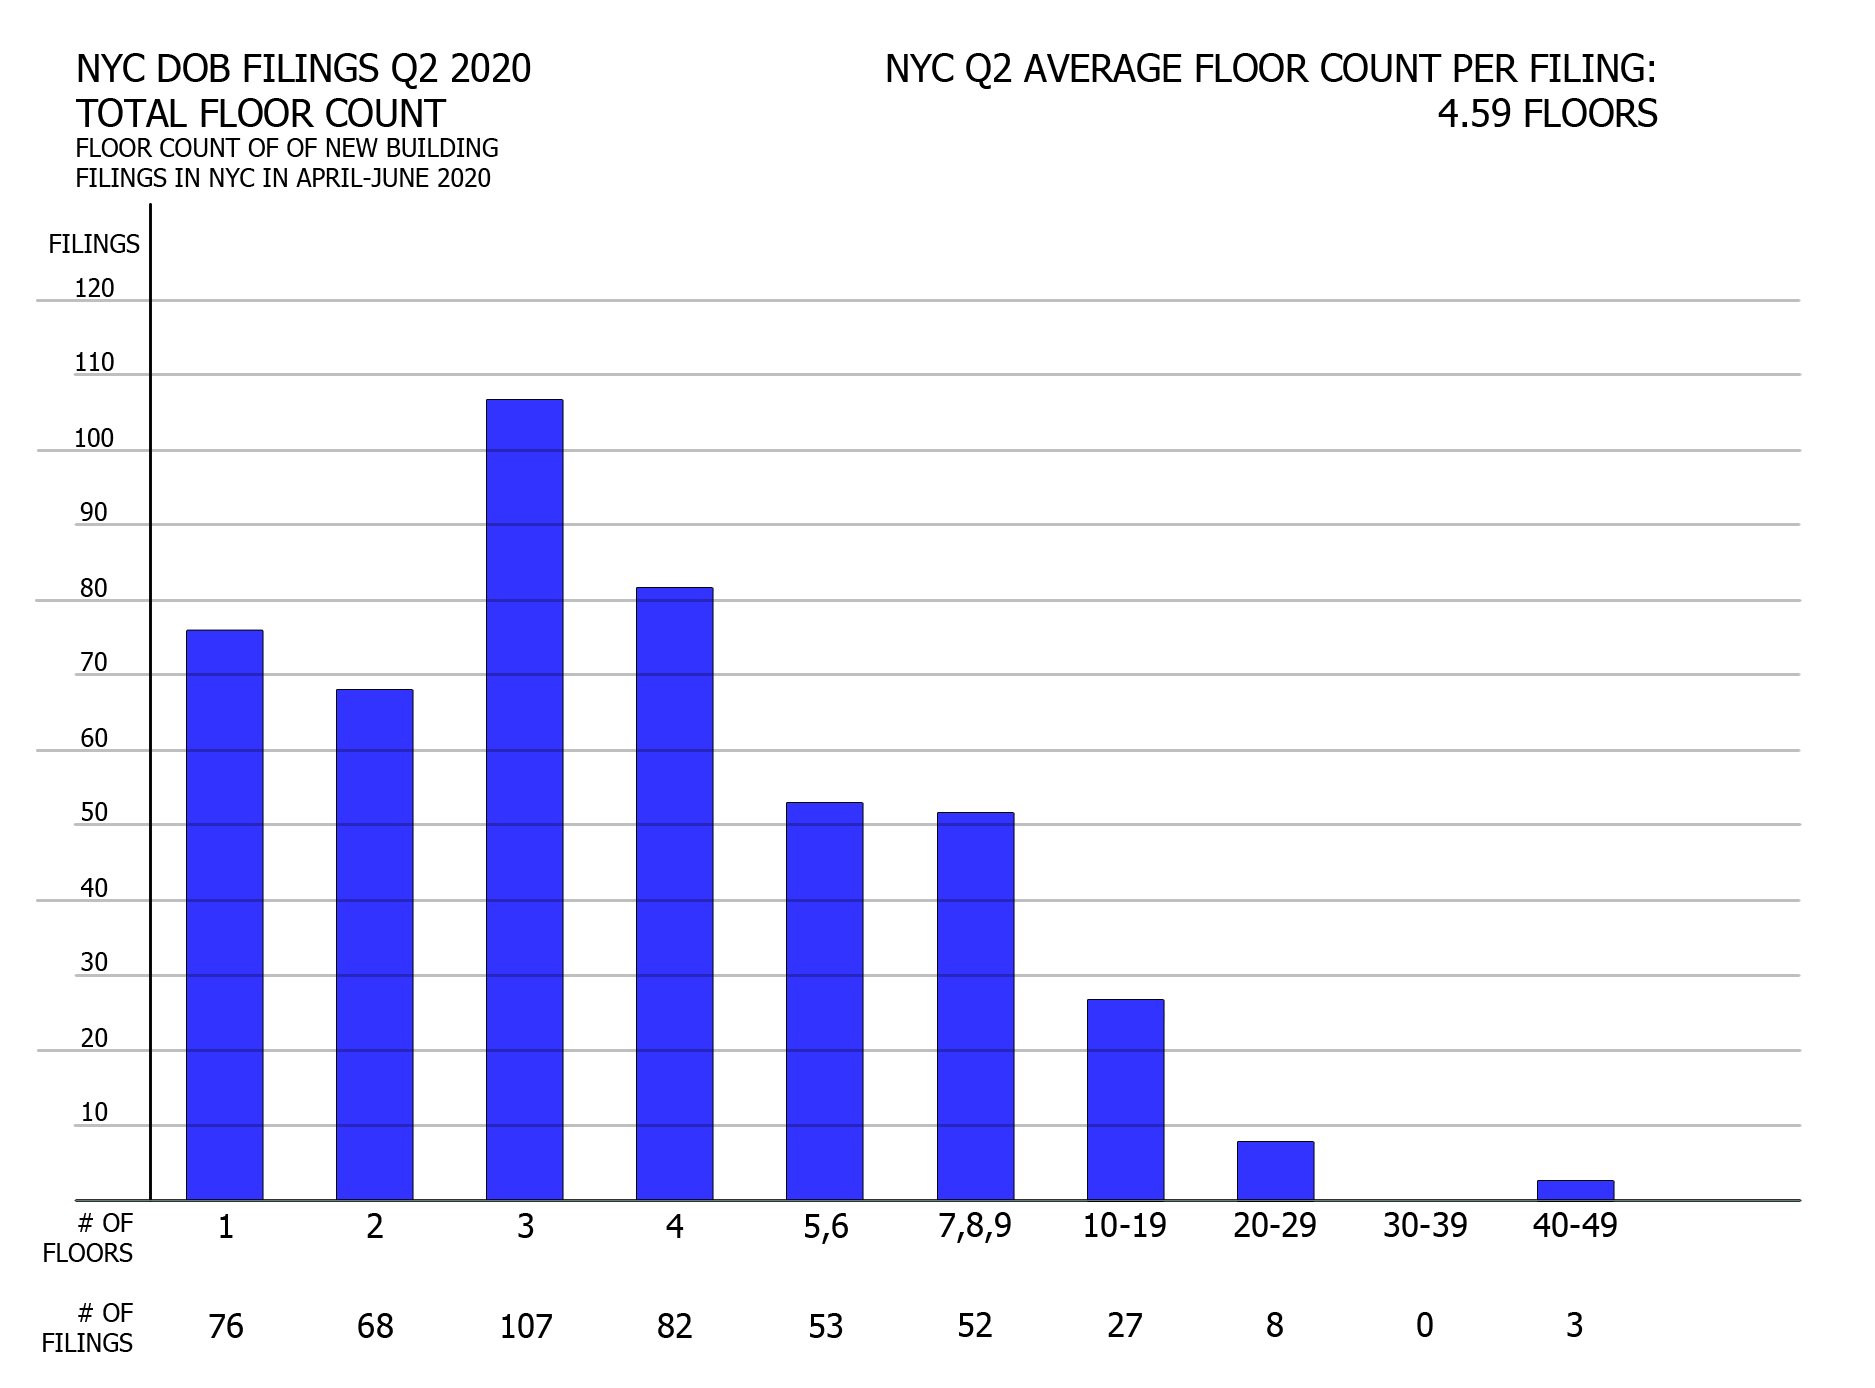 NYC Q2 2020 filings - Filings grouped by floor count. Image credit: Vitali Ogorodnikov